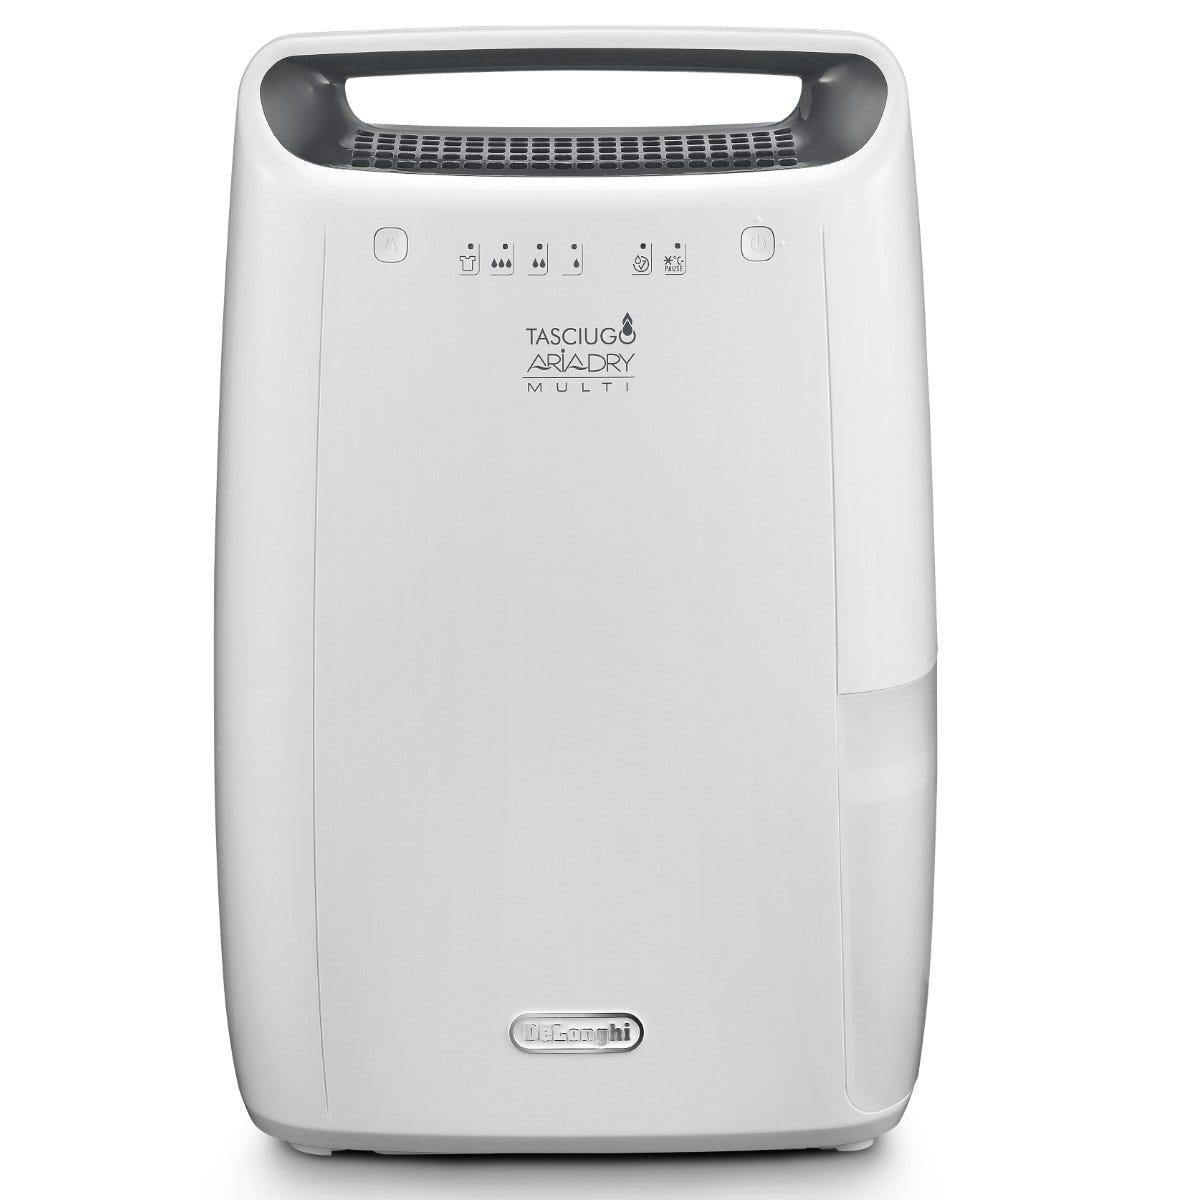 De'Longhi AriaDry Multi Dehumidifier 14L - White